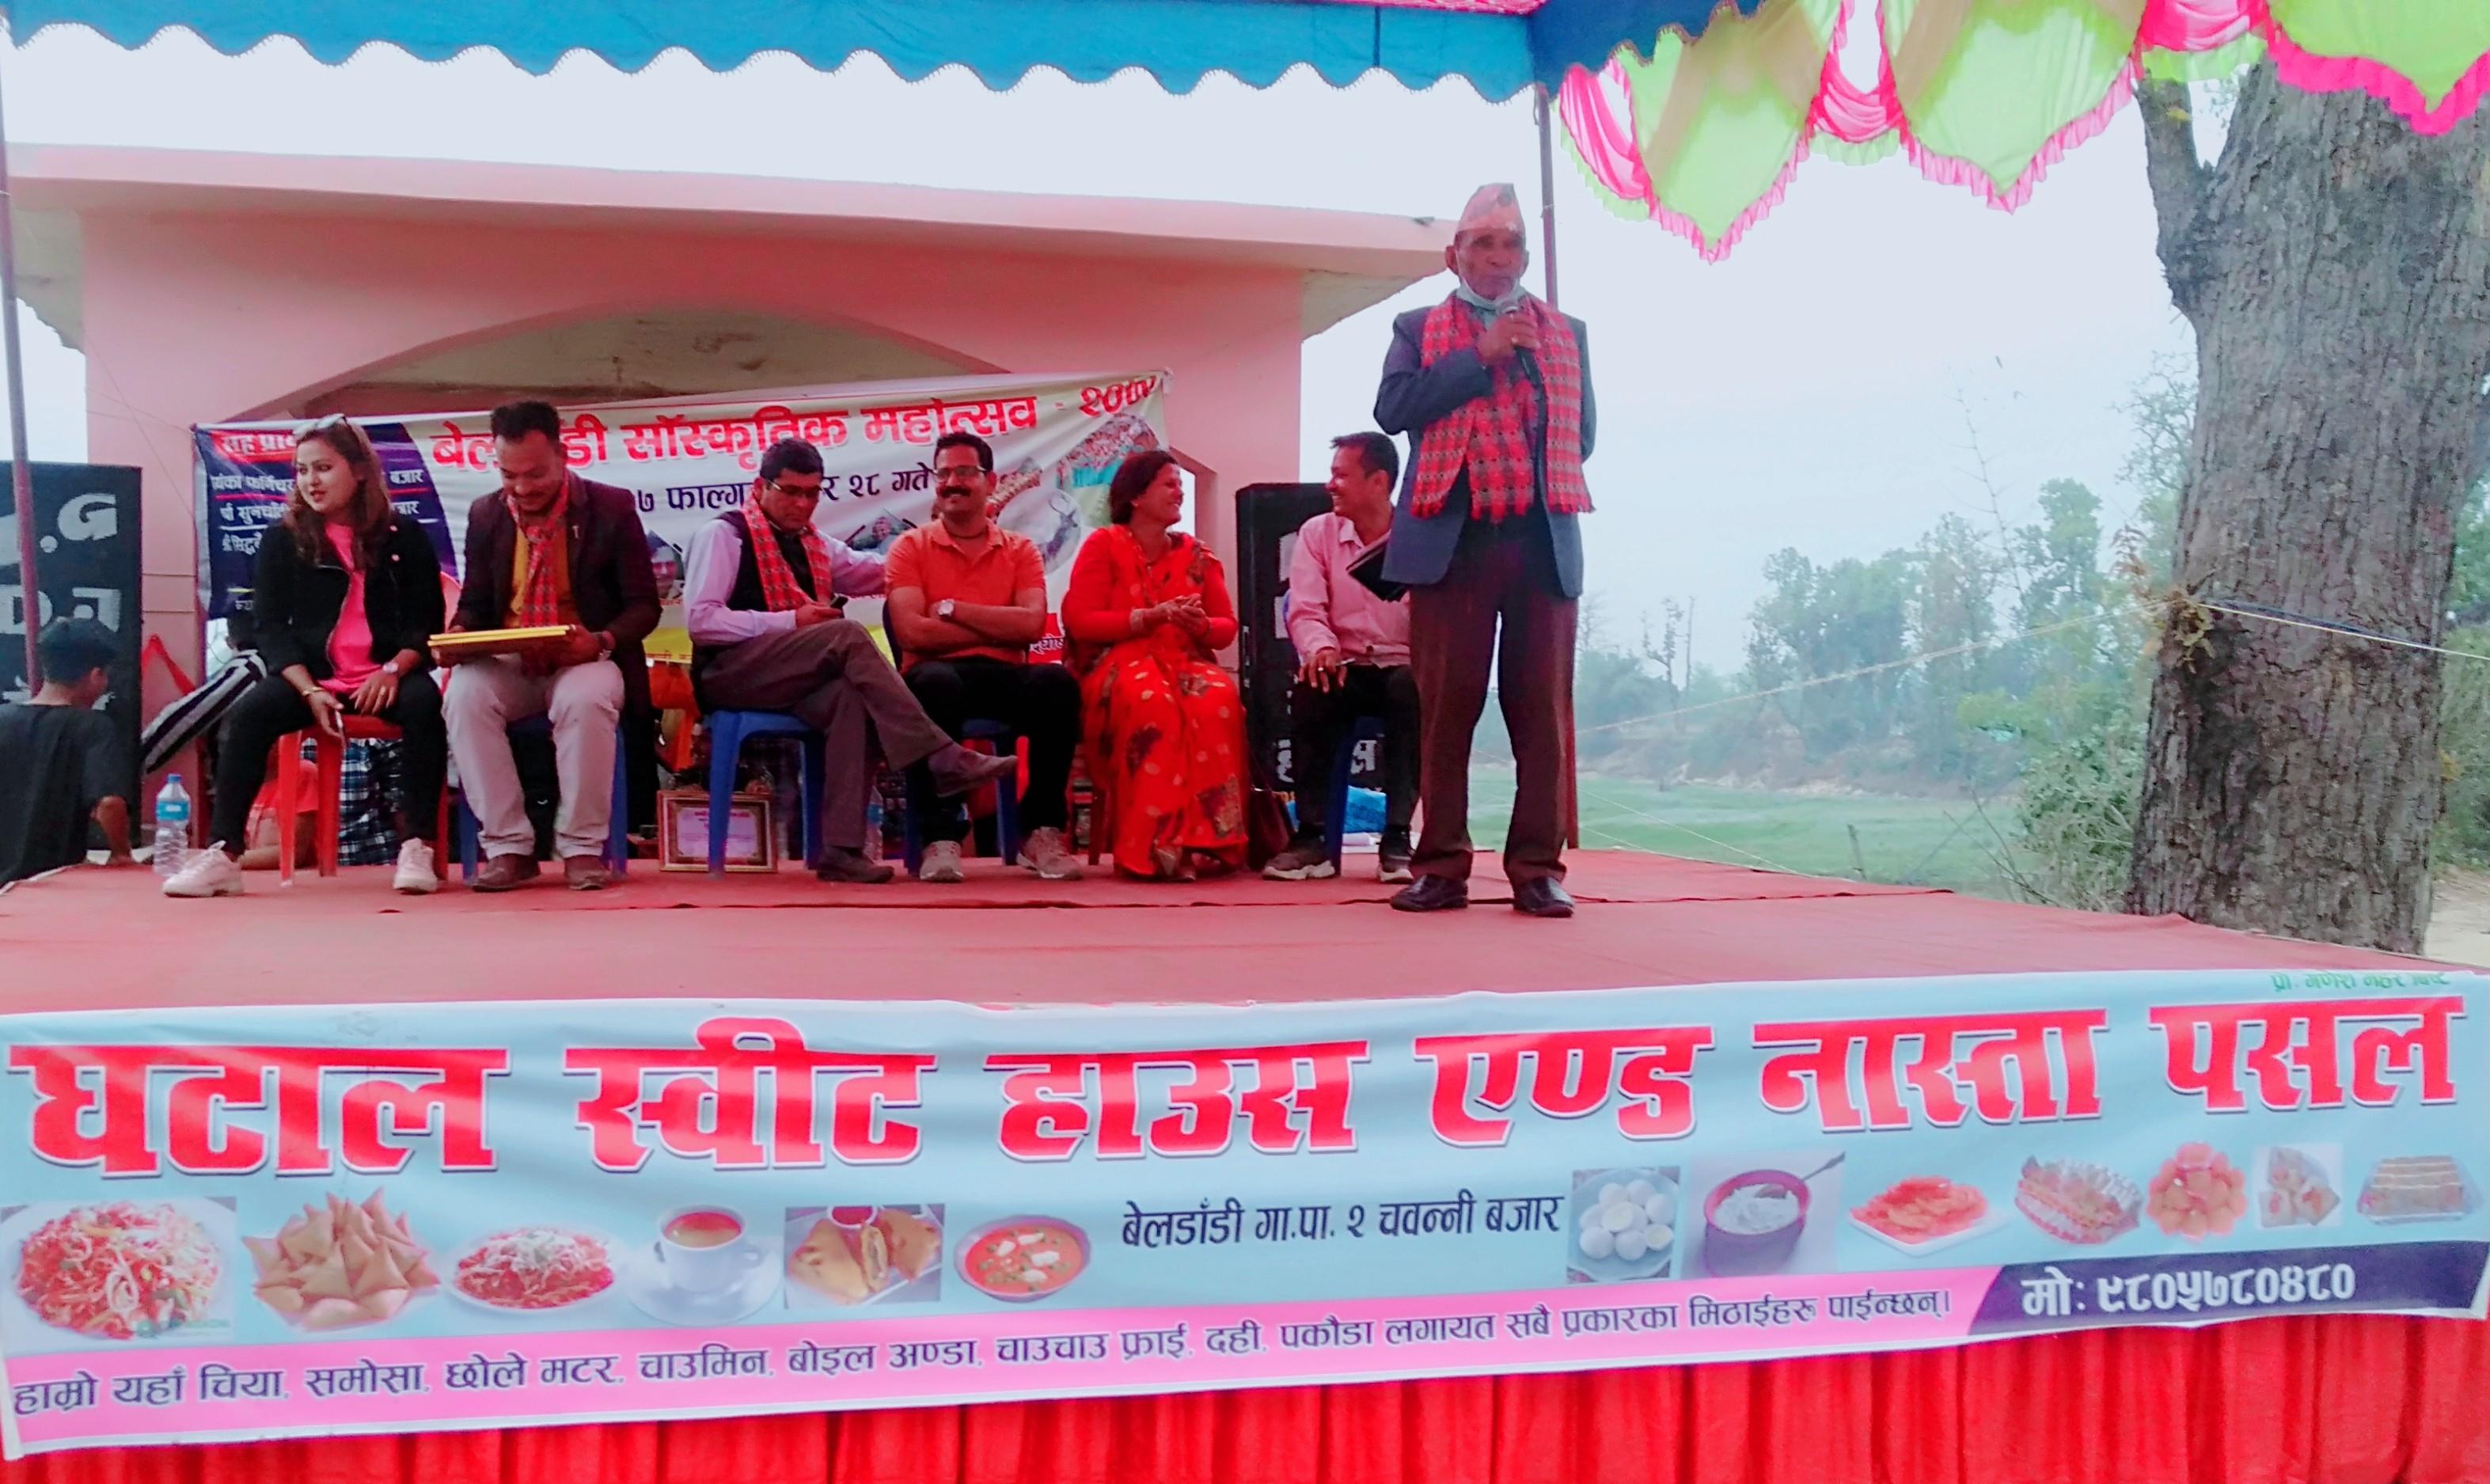 https://www.nepalbodh.com/others/entertainment/1256